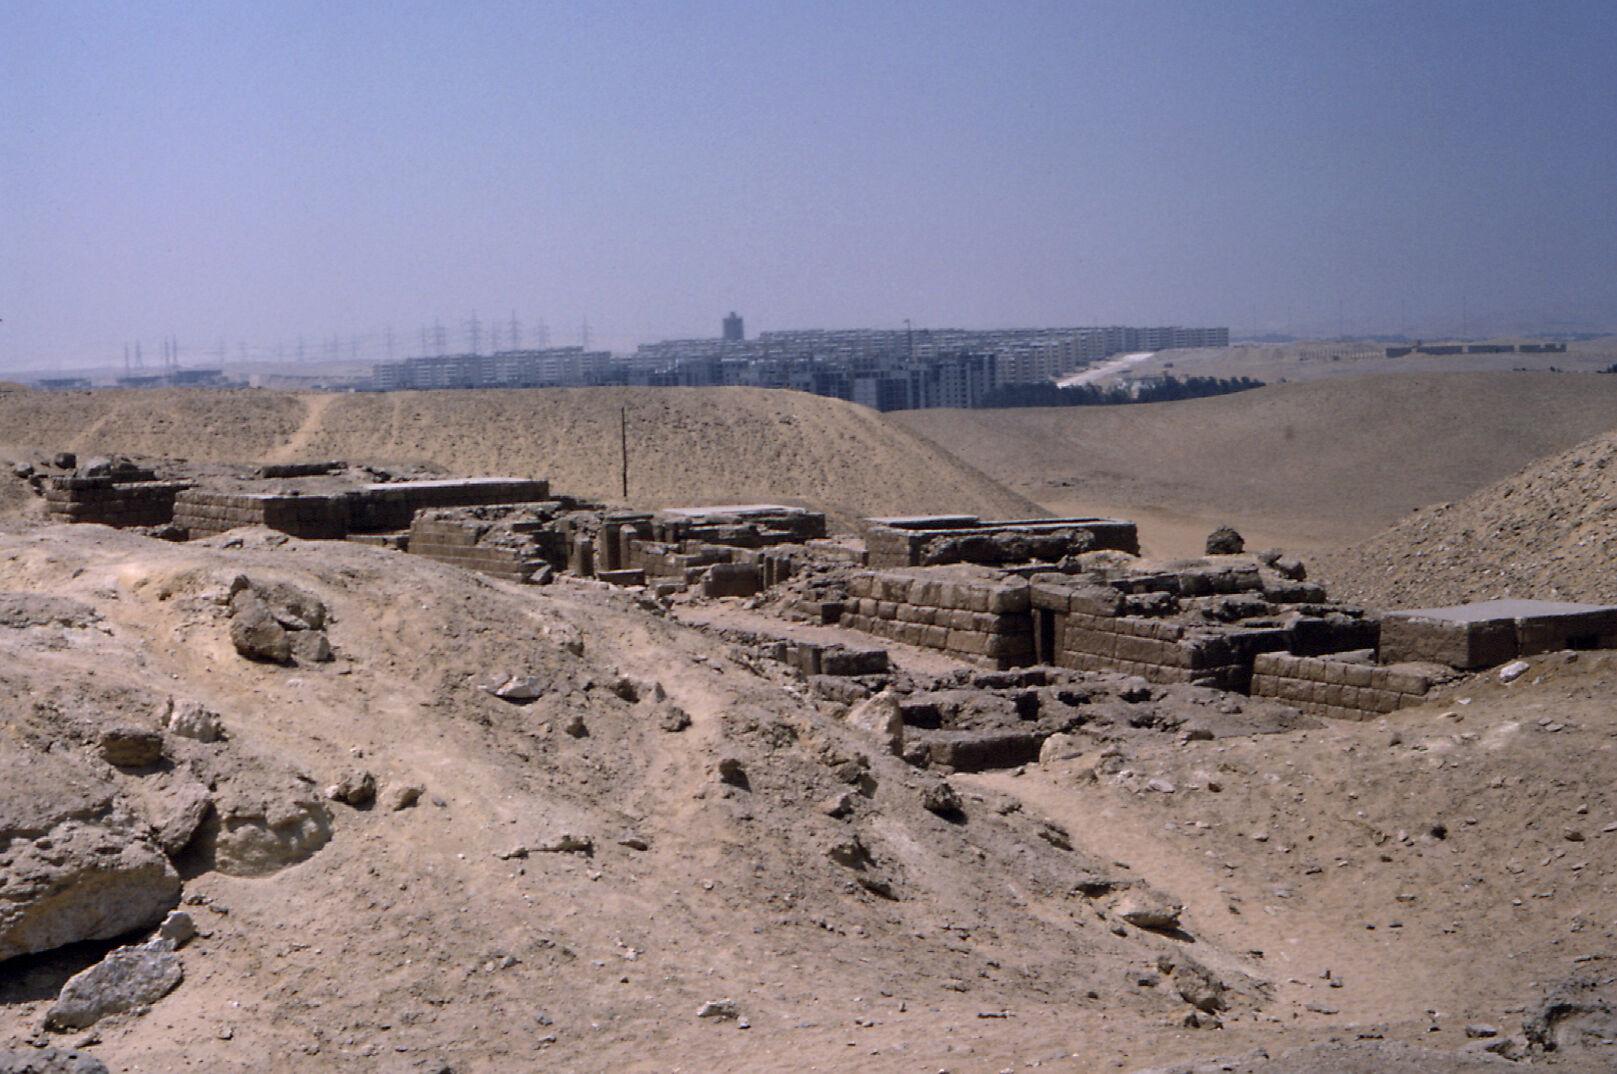 Western Cemetery: Site: Giza; View: G 2084, G 2085, G 2086, G 2087, G 2088, G 2089, G 2091, G 2092a, G 2094, G 2095, G 2096, G 2097, G 2098, G 2099, G 2240, G 2241, G 2230+2231, G 2092+2093